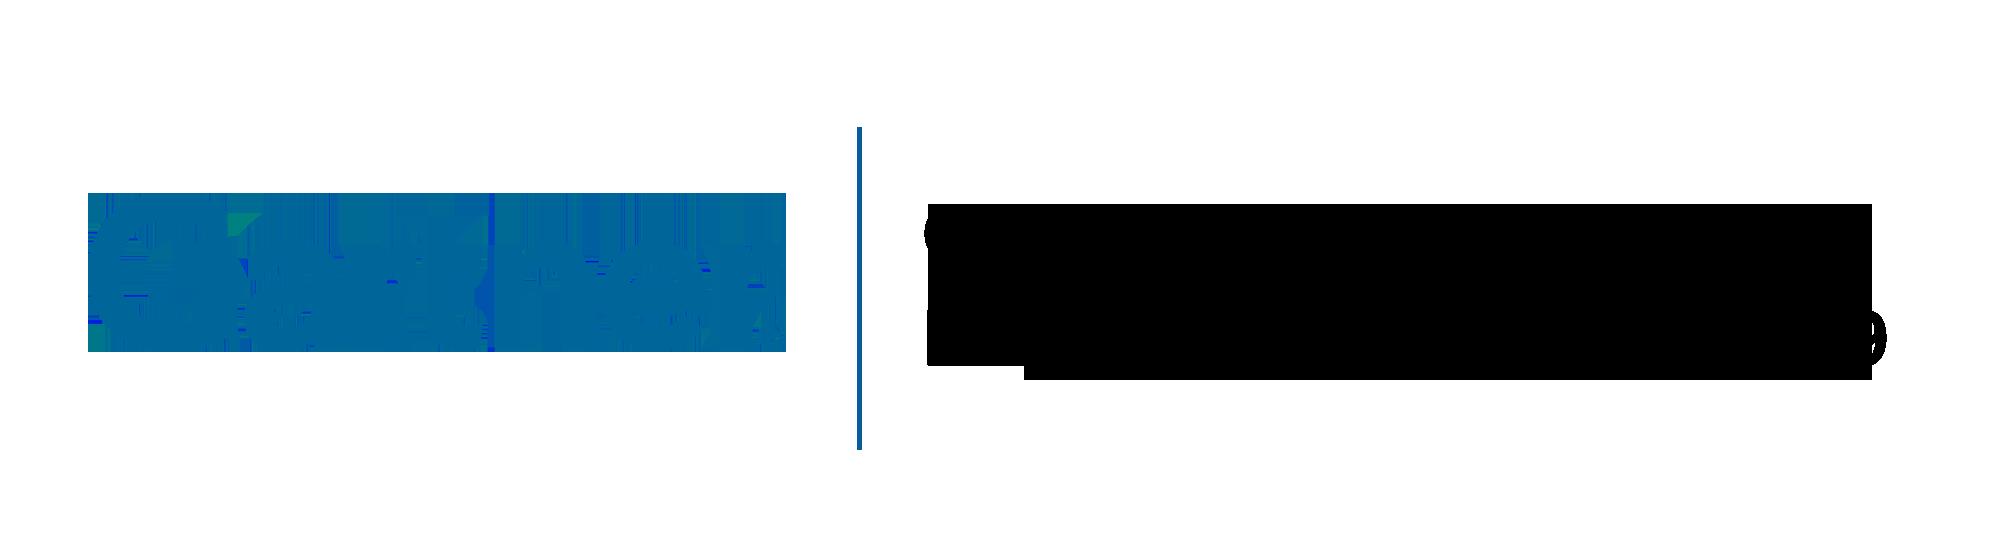 Gartner Security & Risk Management Summit 2019